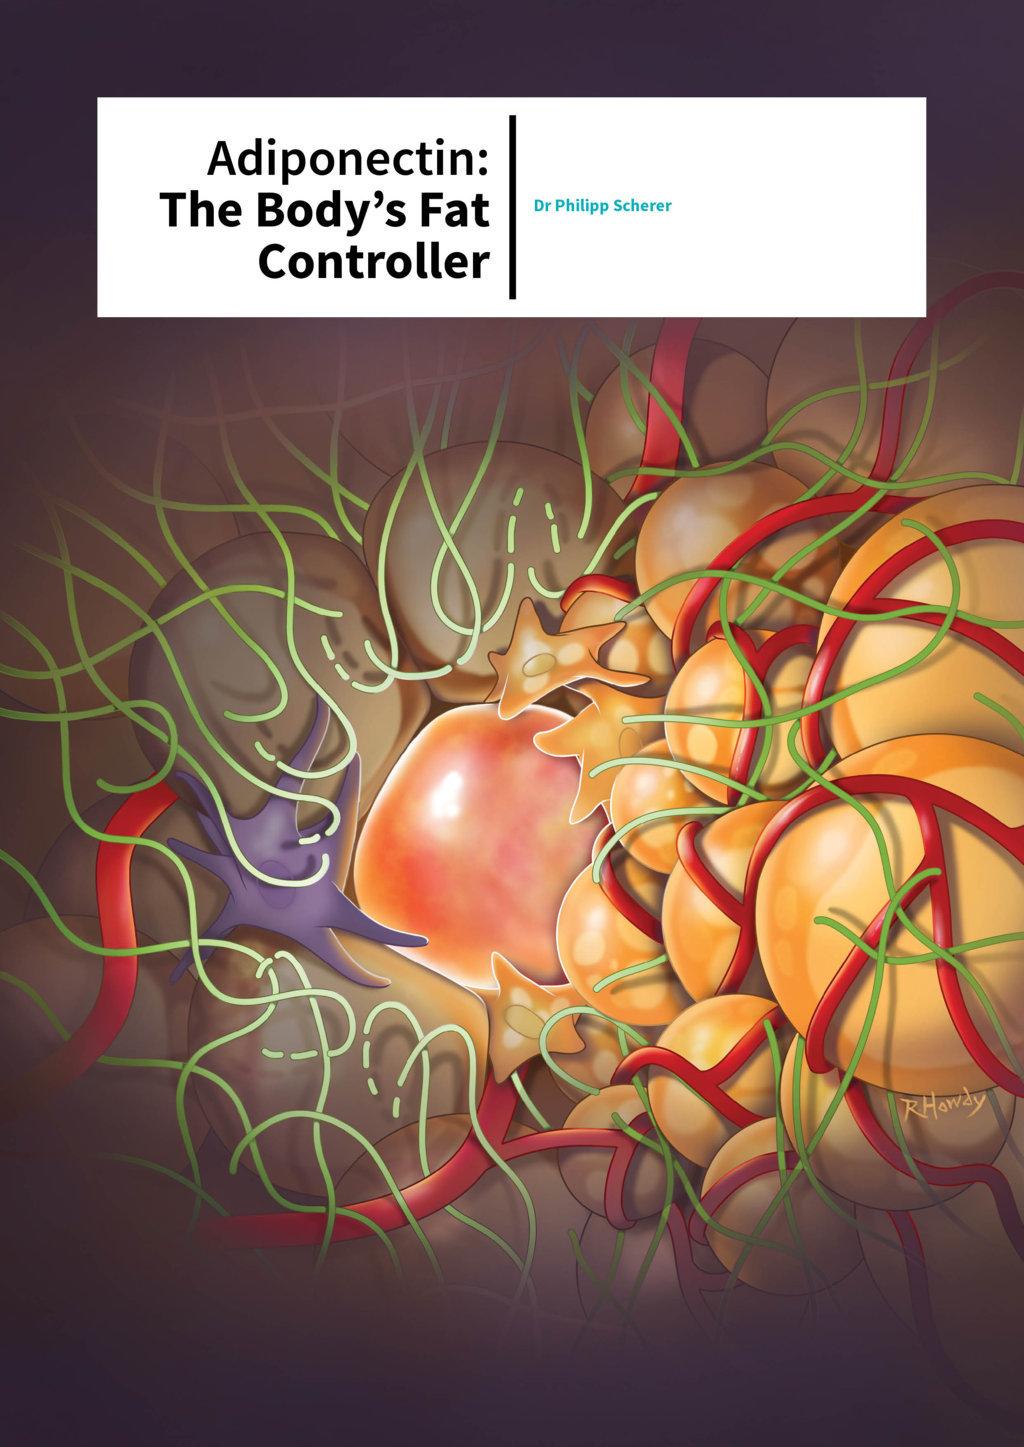 Dr Philipp Scherer – Adiponectin: The Body's Fat Controller